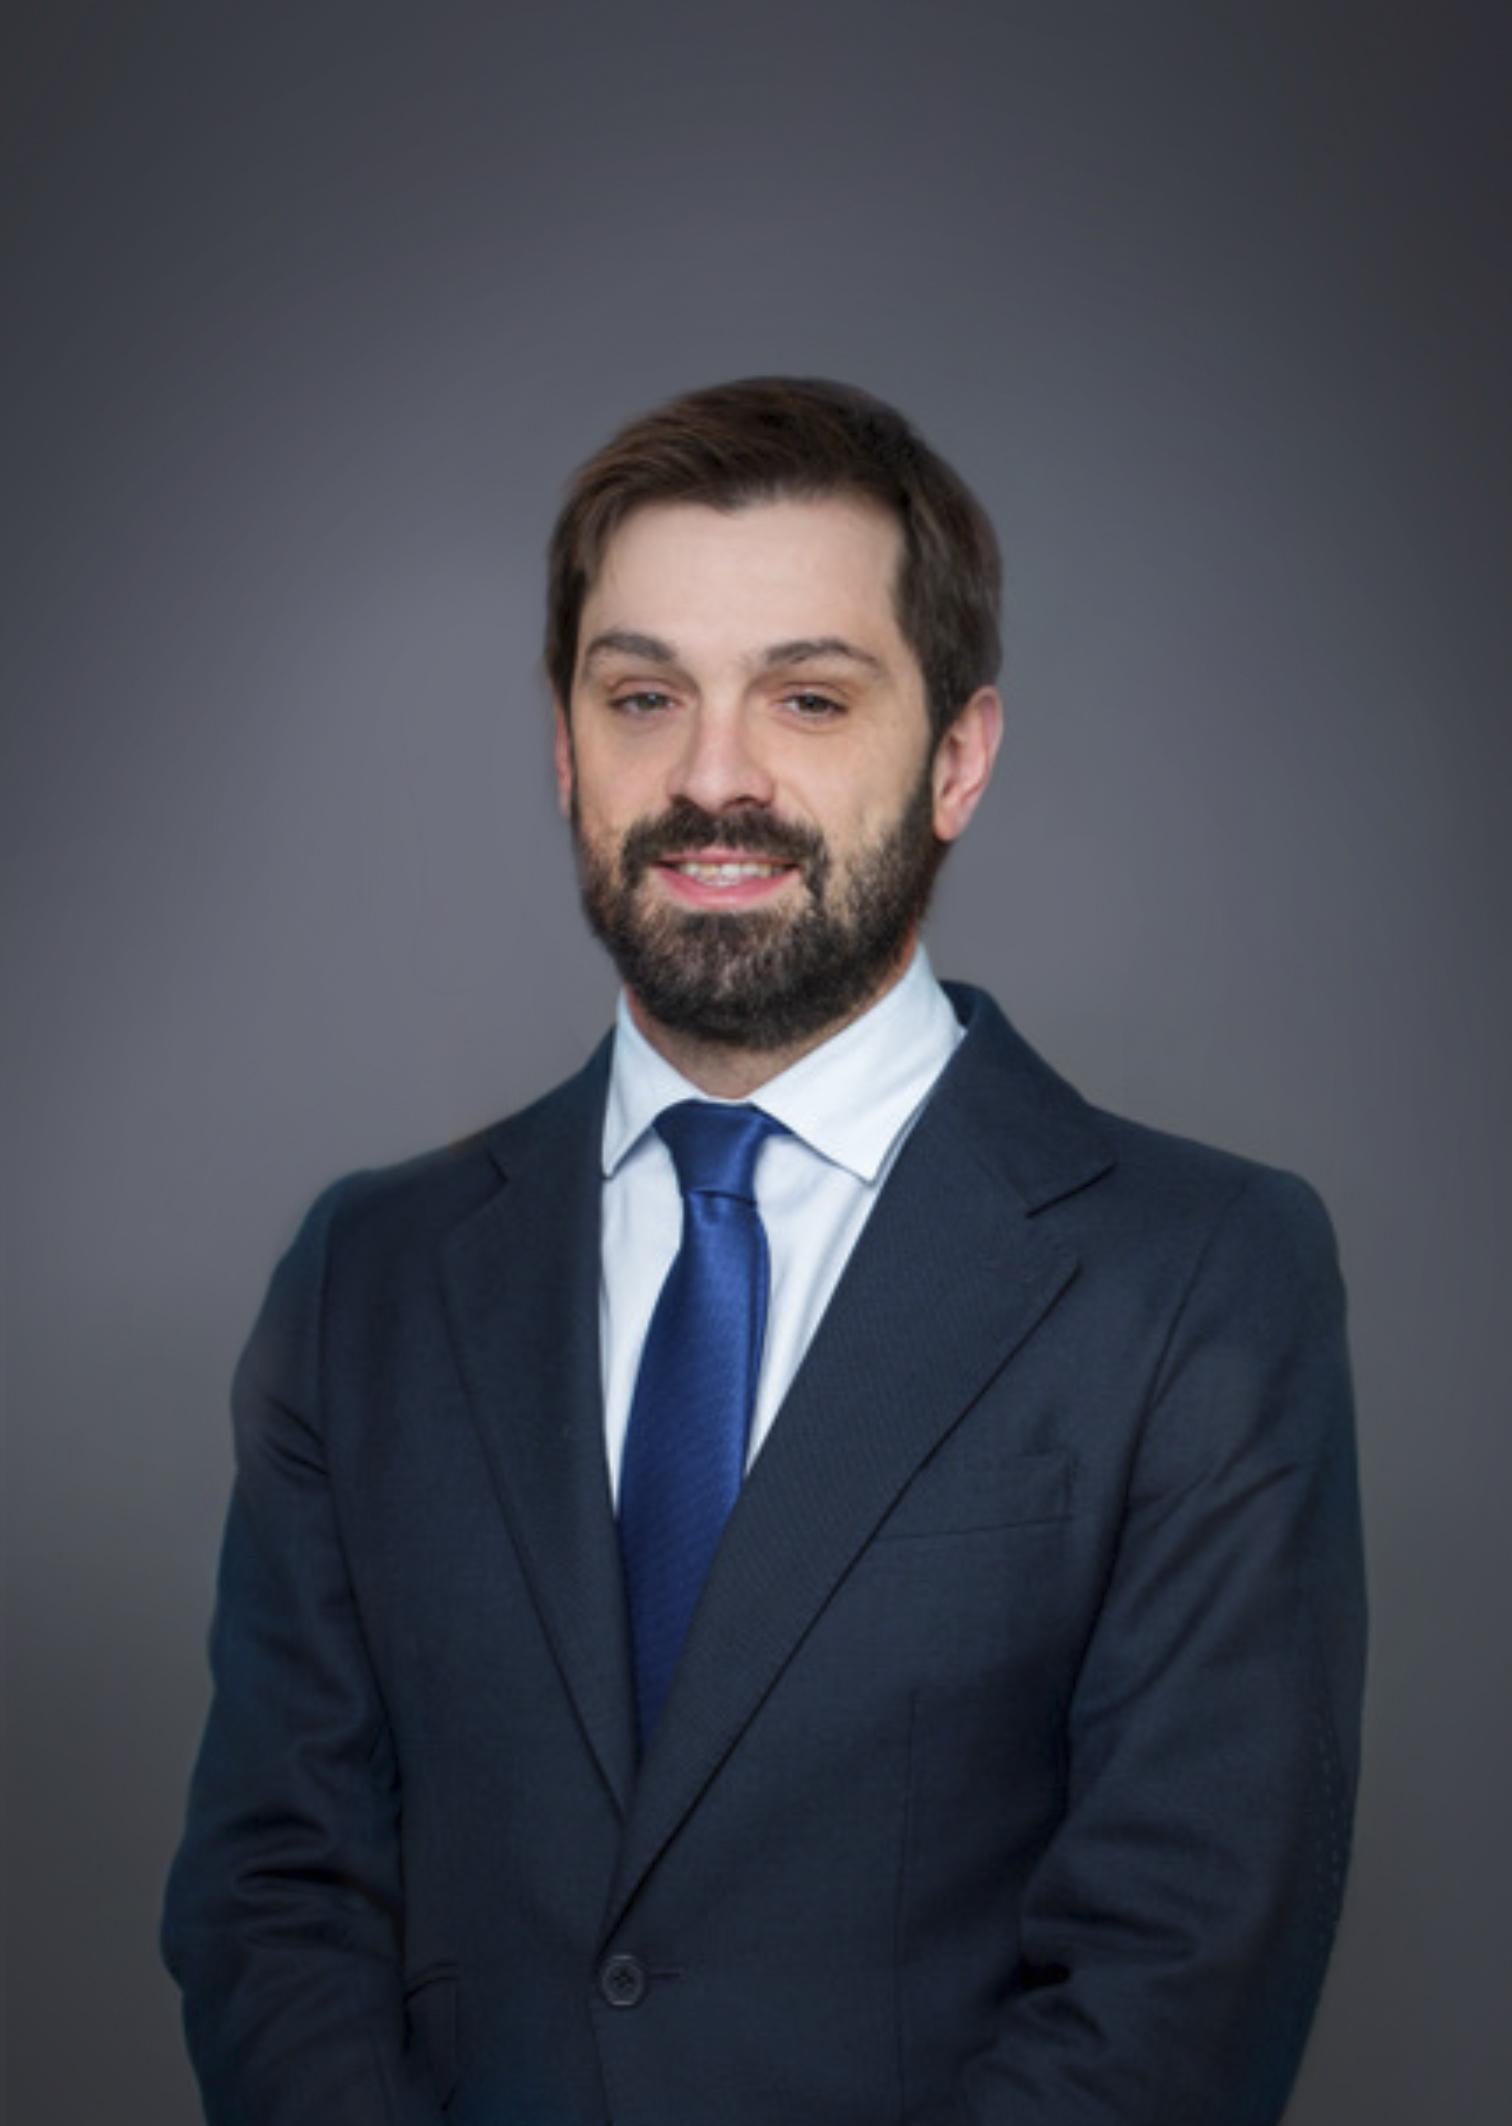 Jorge Latorre Silvestre